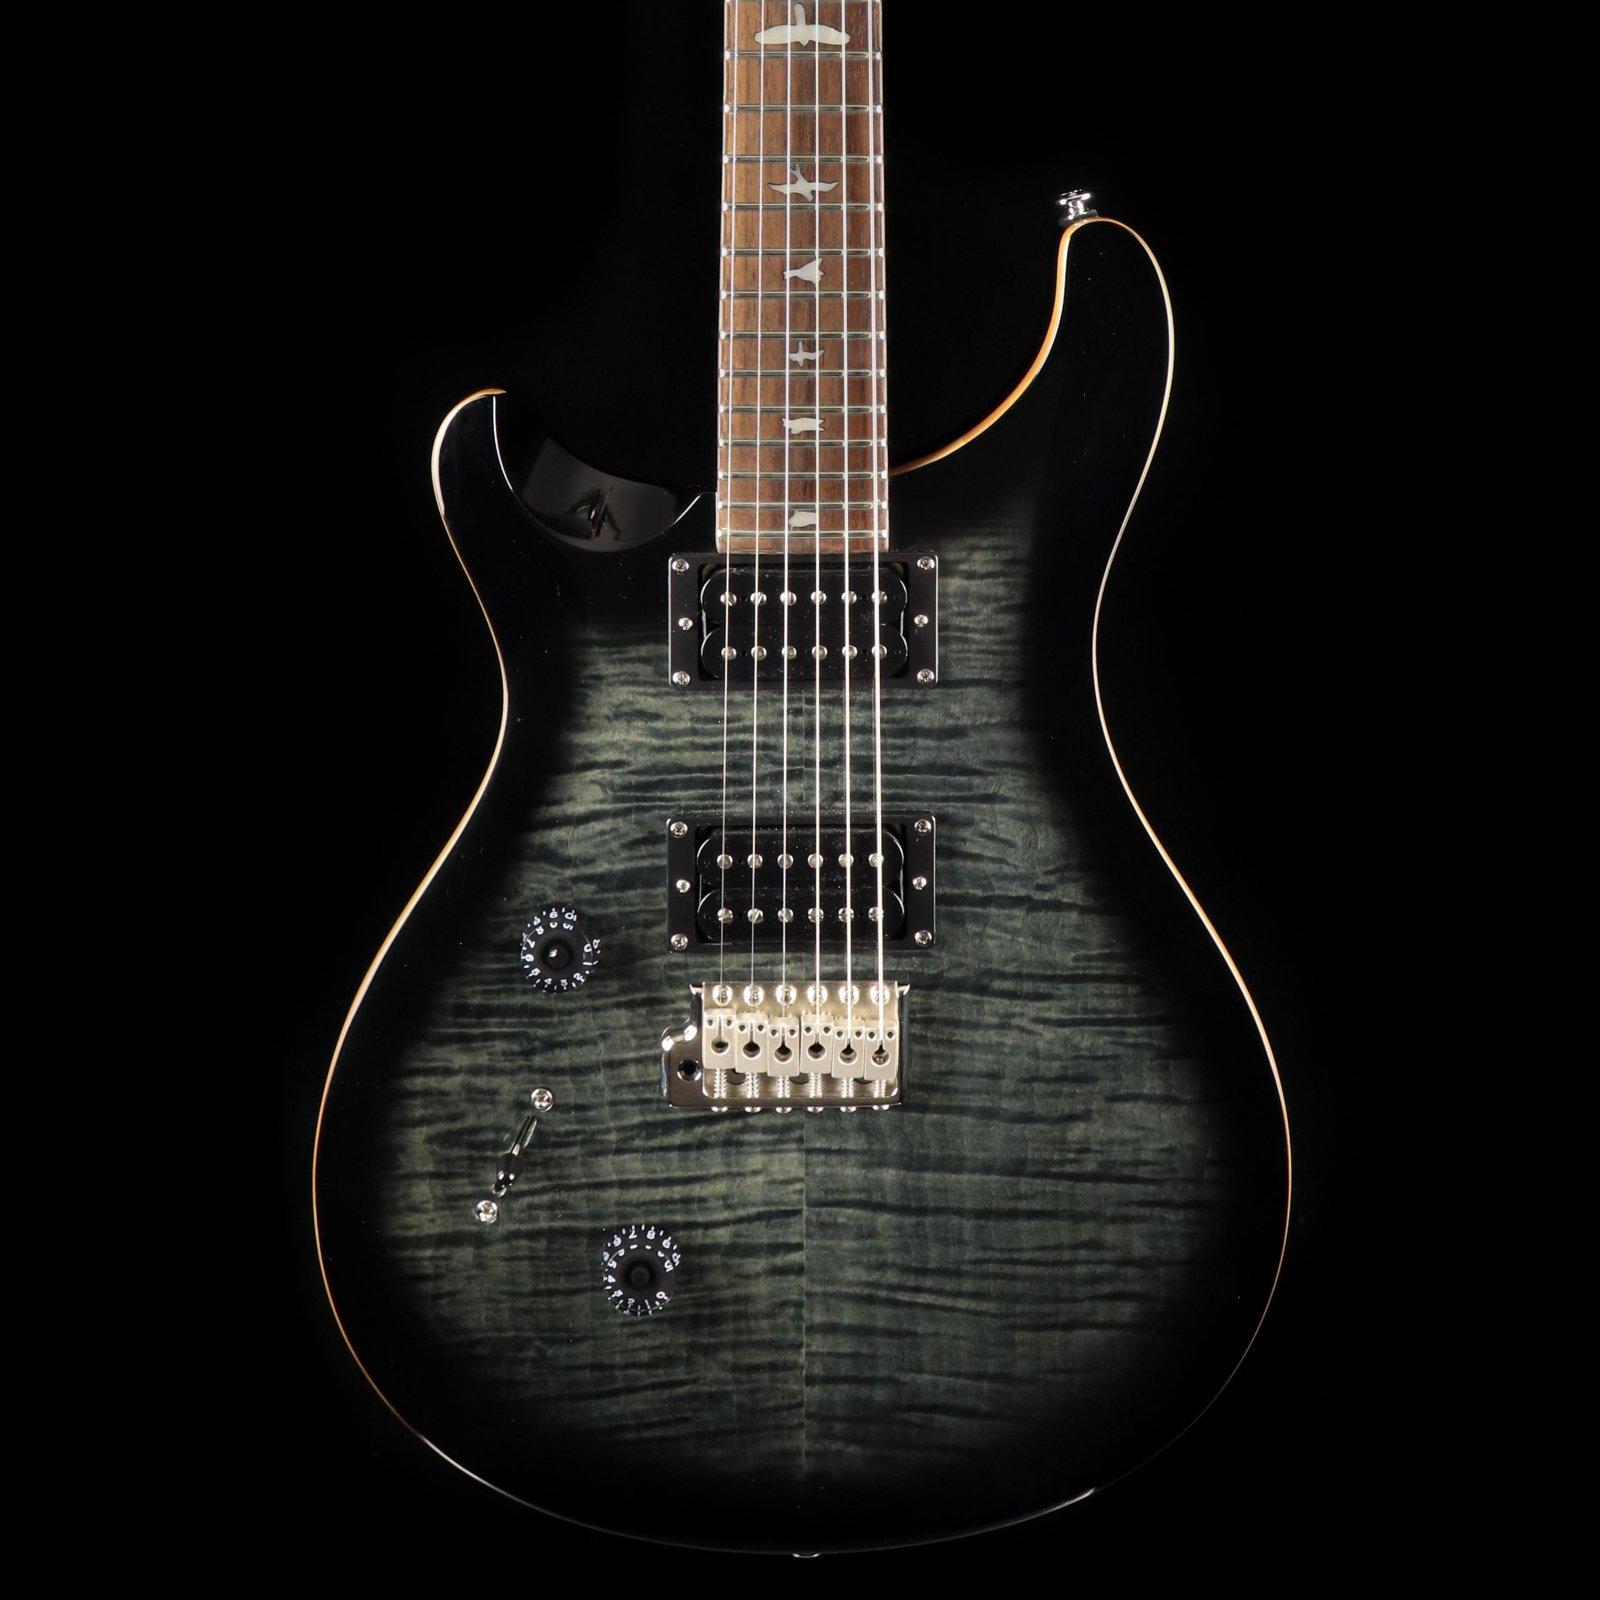 PRS SE Custom 24 Lefty - Charcoal Burst